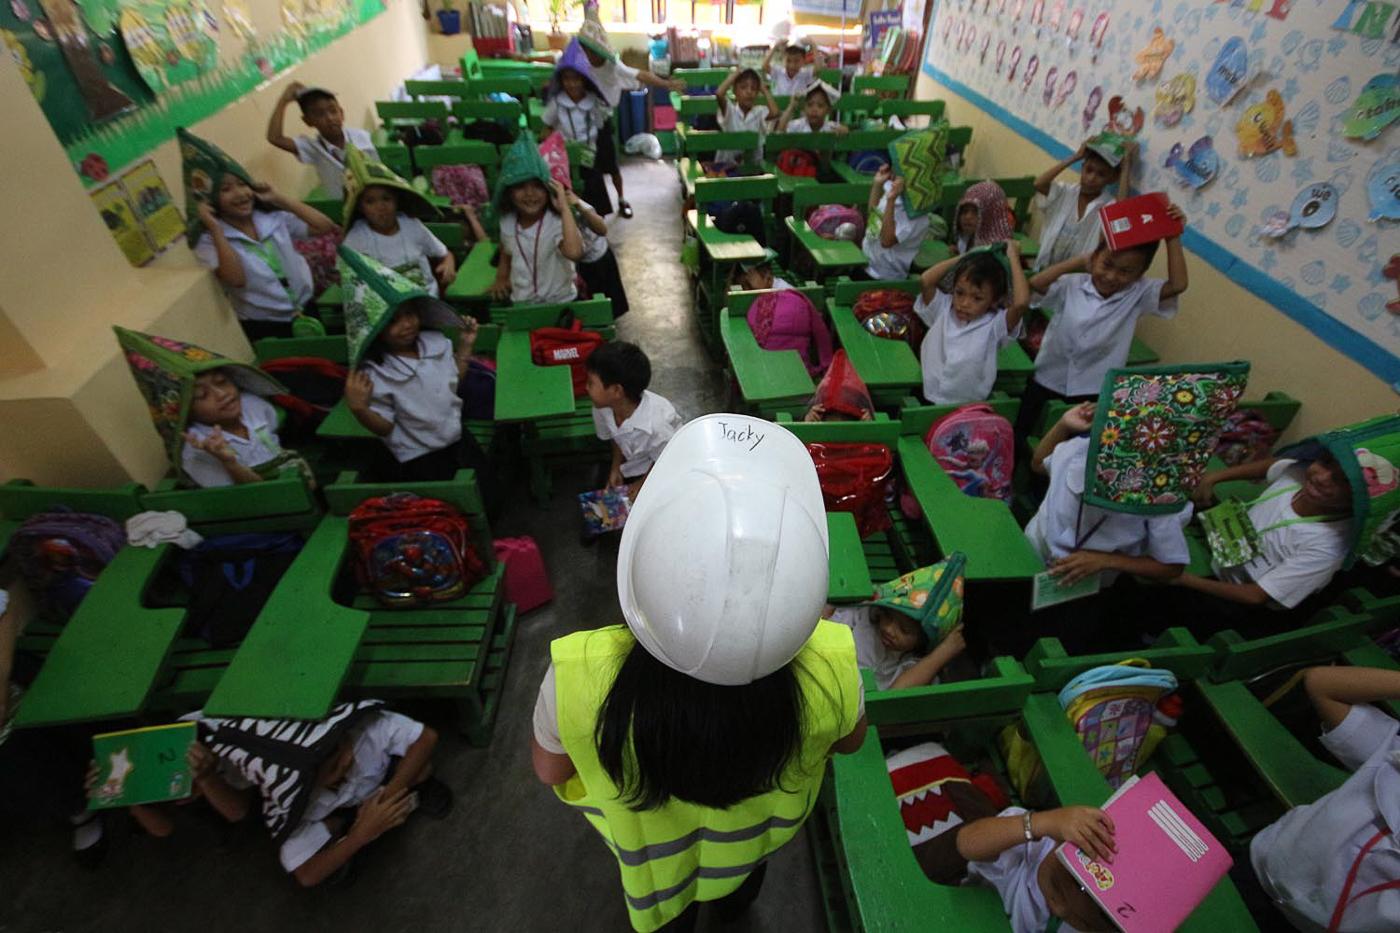 PRACTICE. Students of Corazon C. Aquino Elementary School in Batasan, Quezon City, cover their heads. Photo by Darren Langit/Rappler